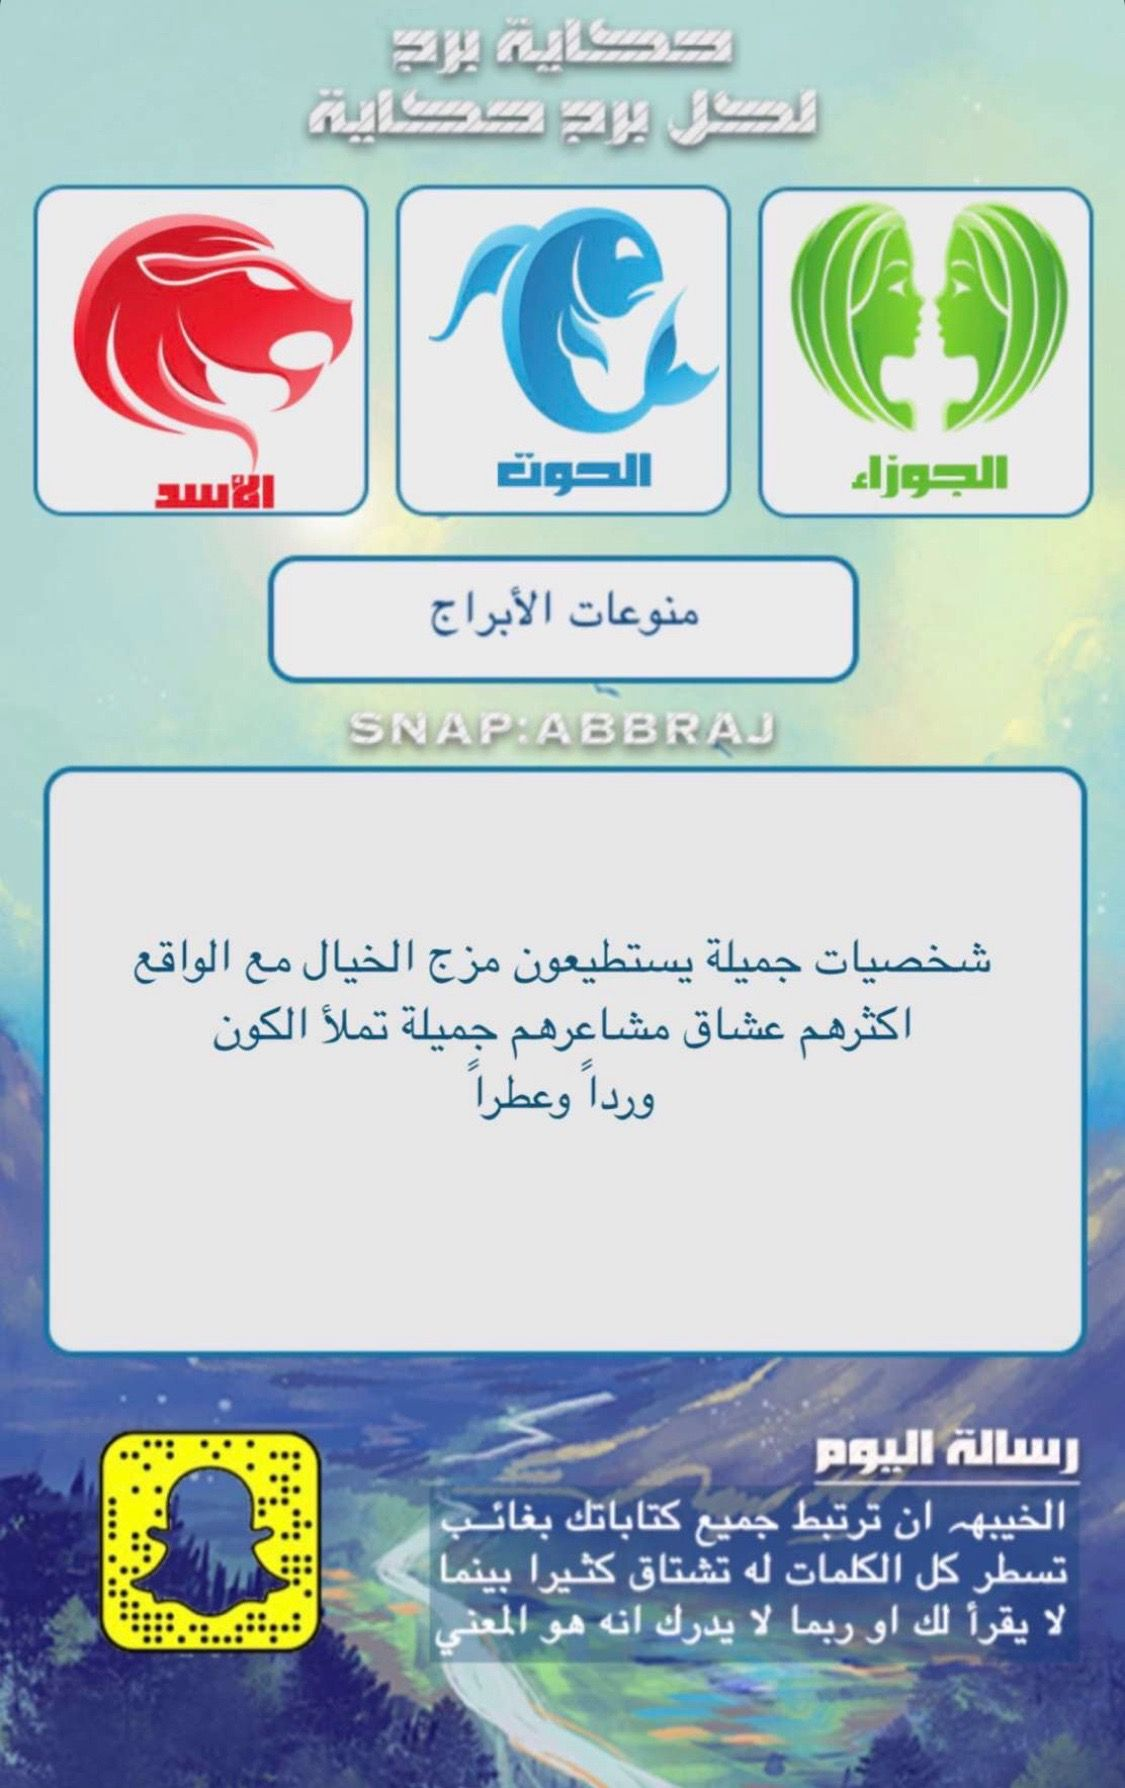 Pin By Alanoud On برج الحوت Magic Words Words Horoscope